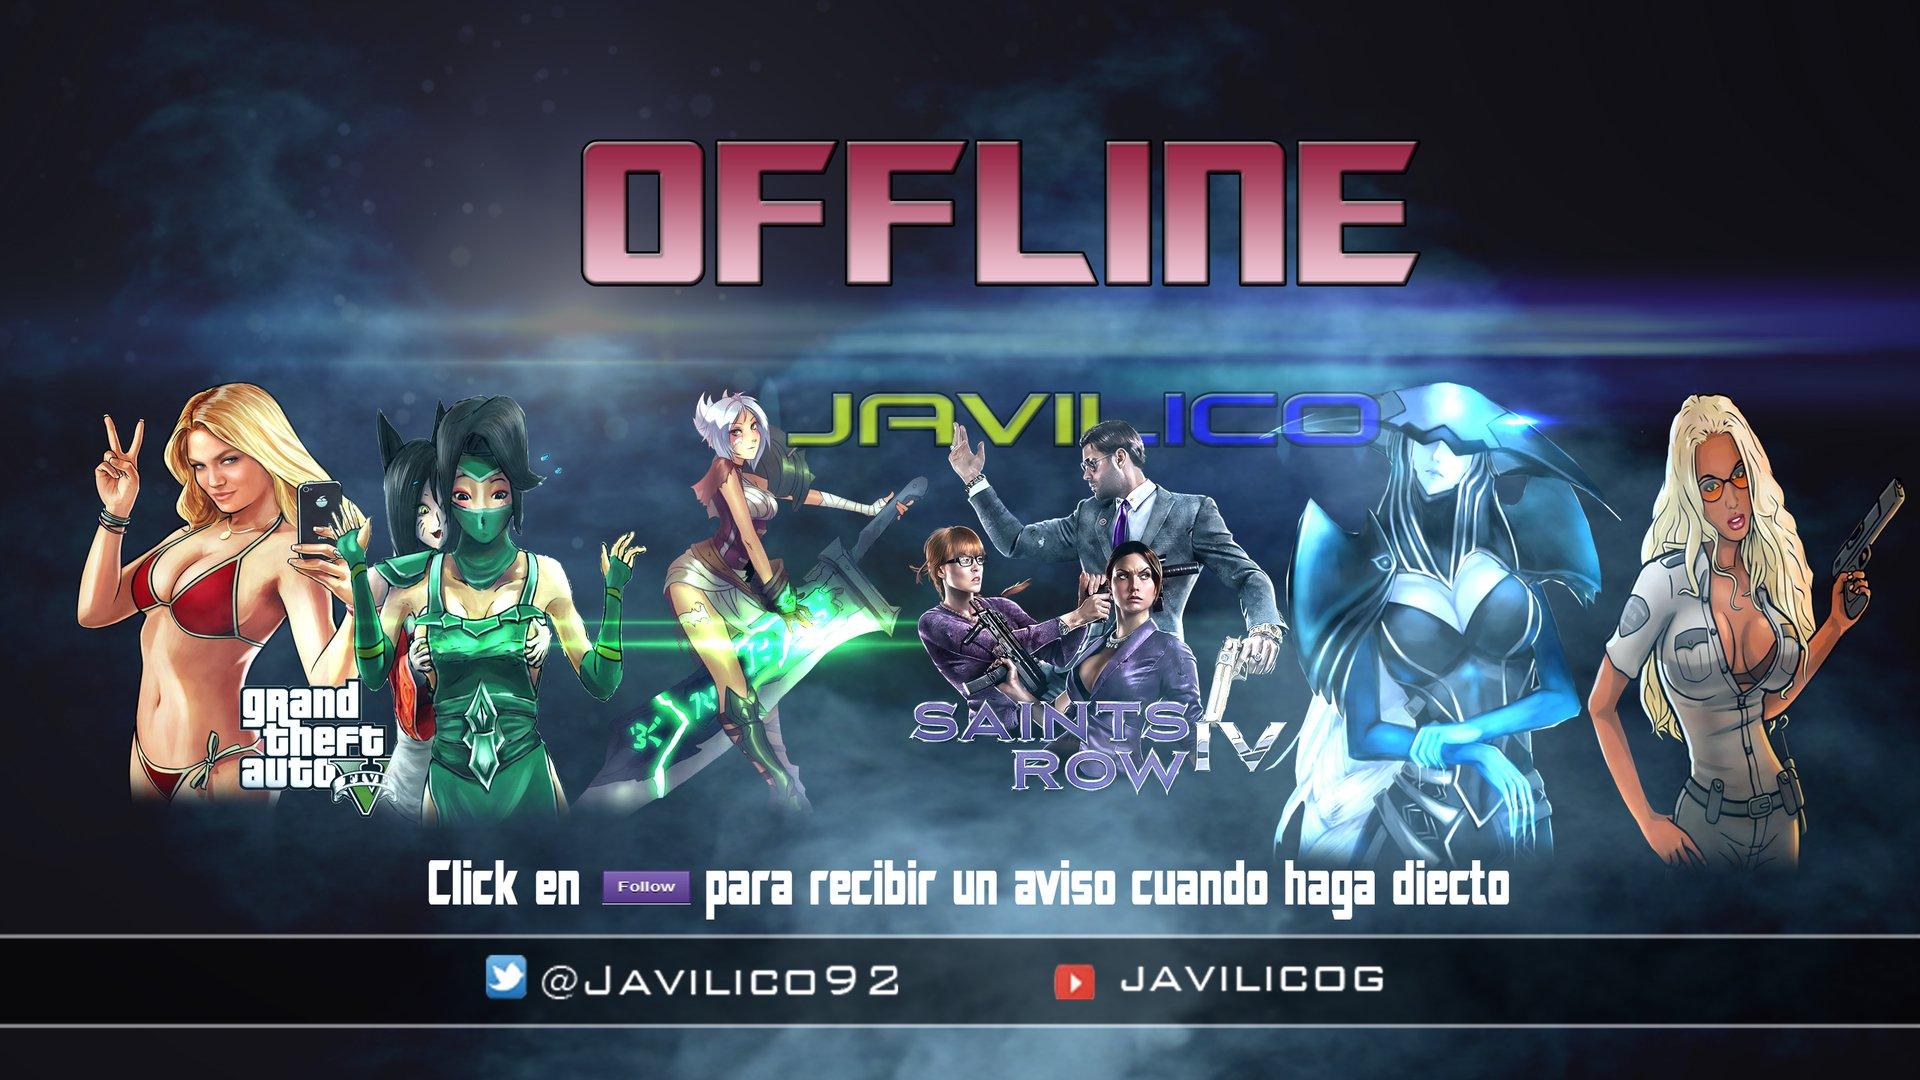 Javilicop